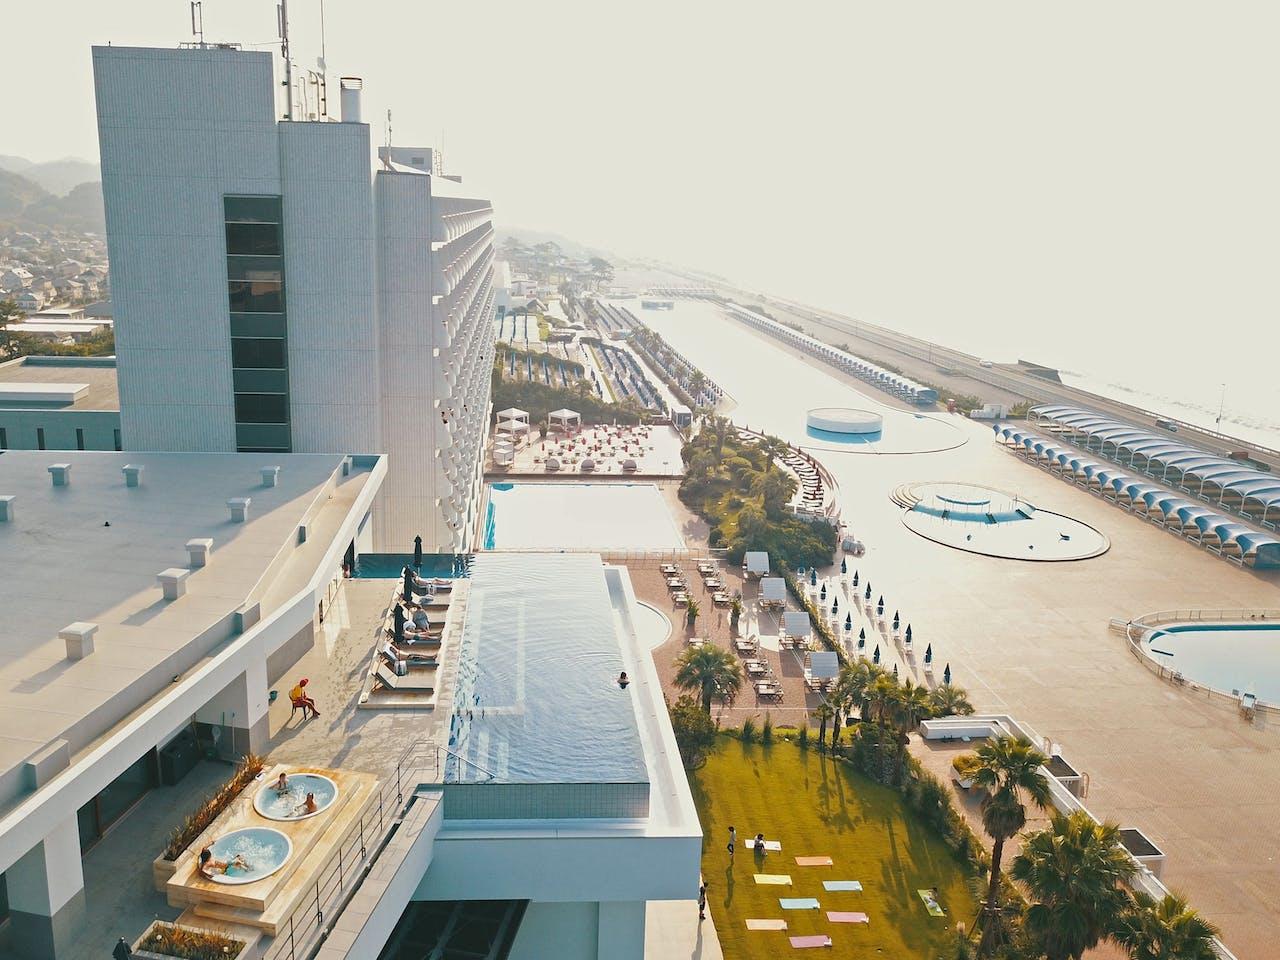 「THERMAL SPA S.WAVE 大磯プリンスホテル」外観イメージ